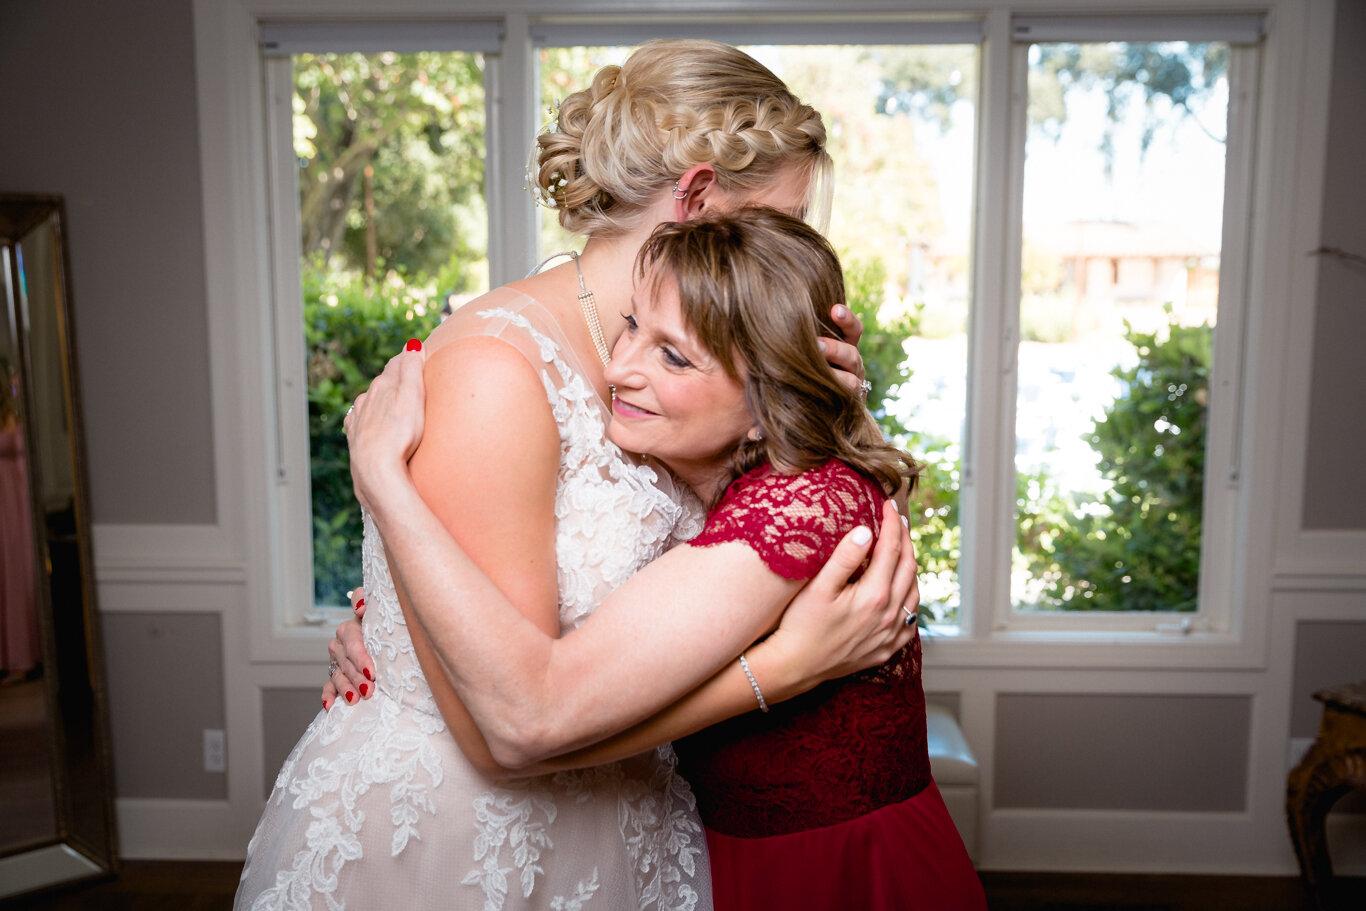 2019.08.24_Emily-Ashir-Wedding-at-the-Maples-5233.jpg